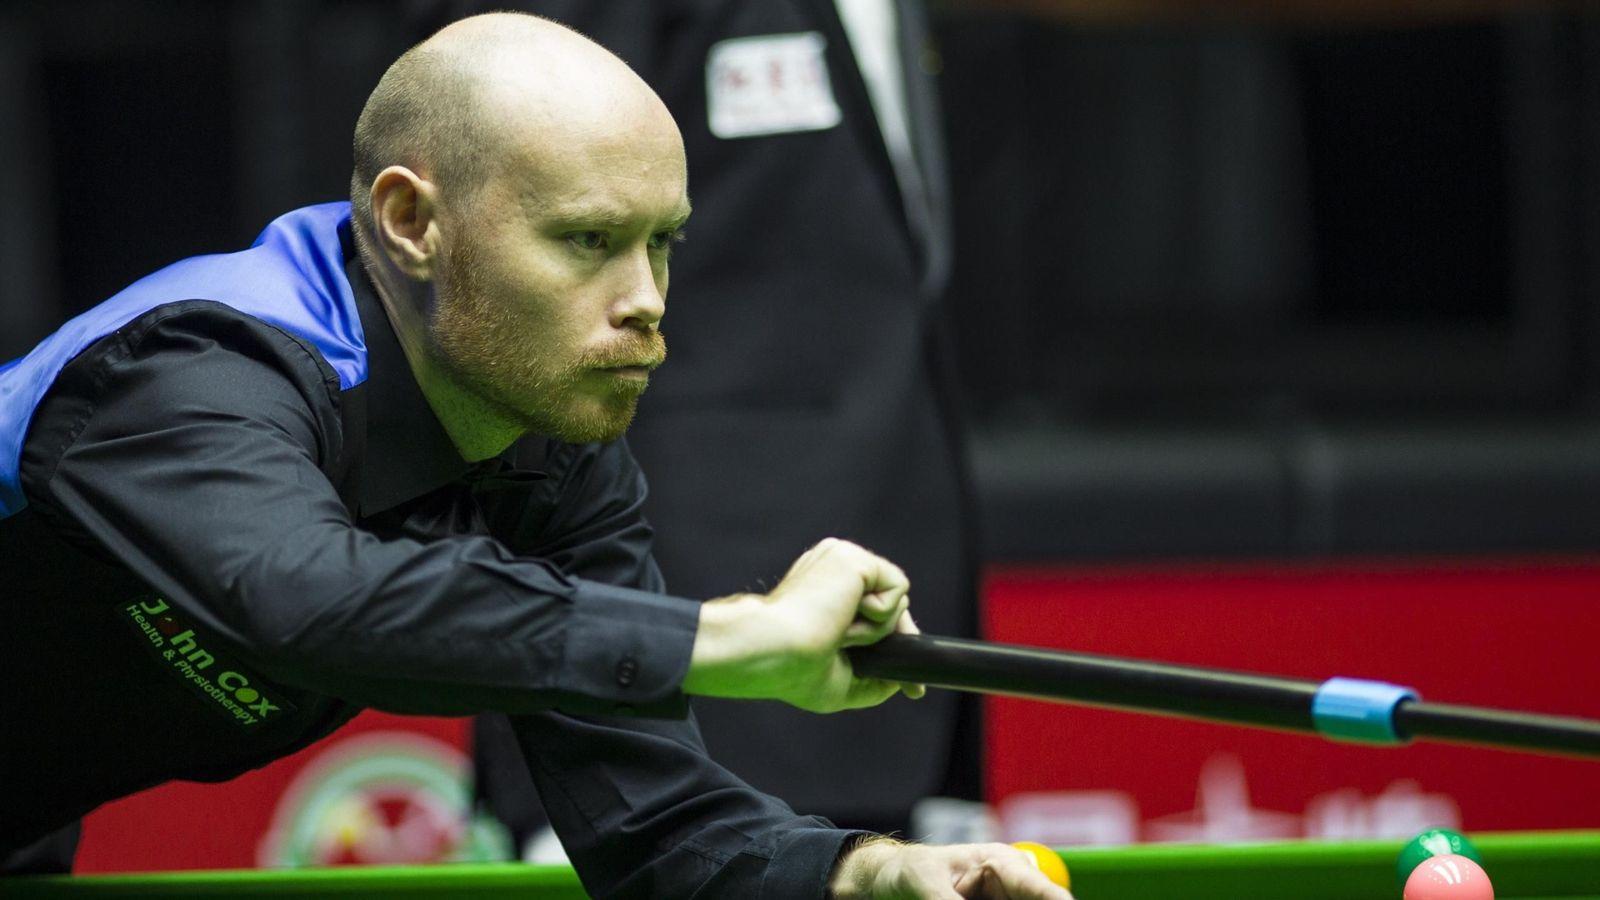 Calendrier Snooker 2021 Gary Wilson   Lei Peifan   Masters d'Allemagne 2021 | 1er tour des